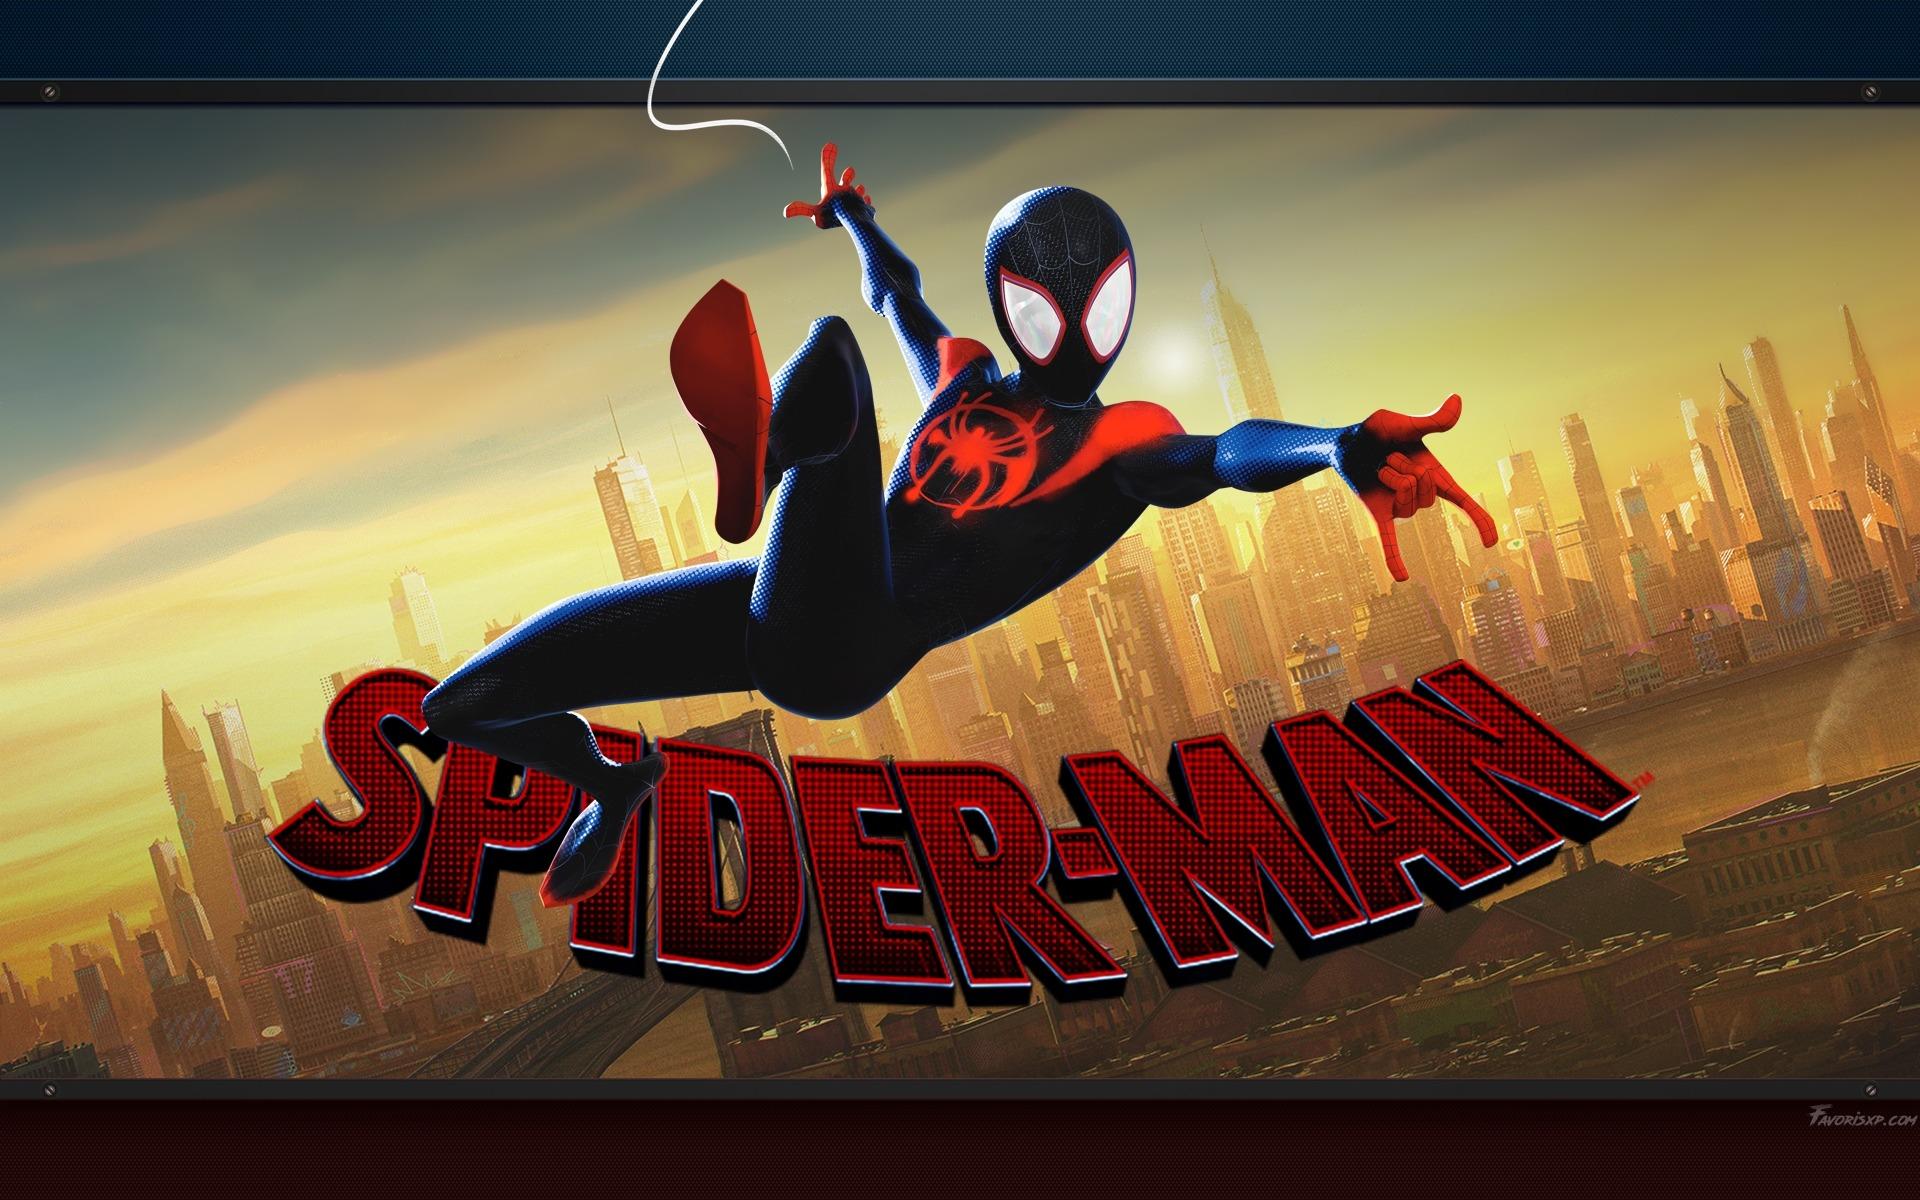 Spider Man New Generation Fonds D Ecran Image Arriere Plan